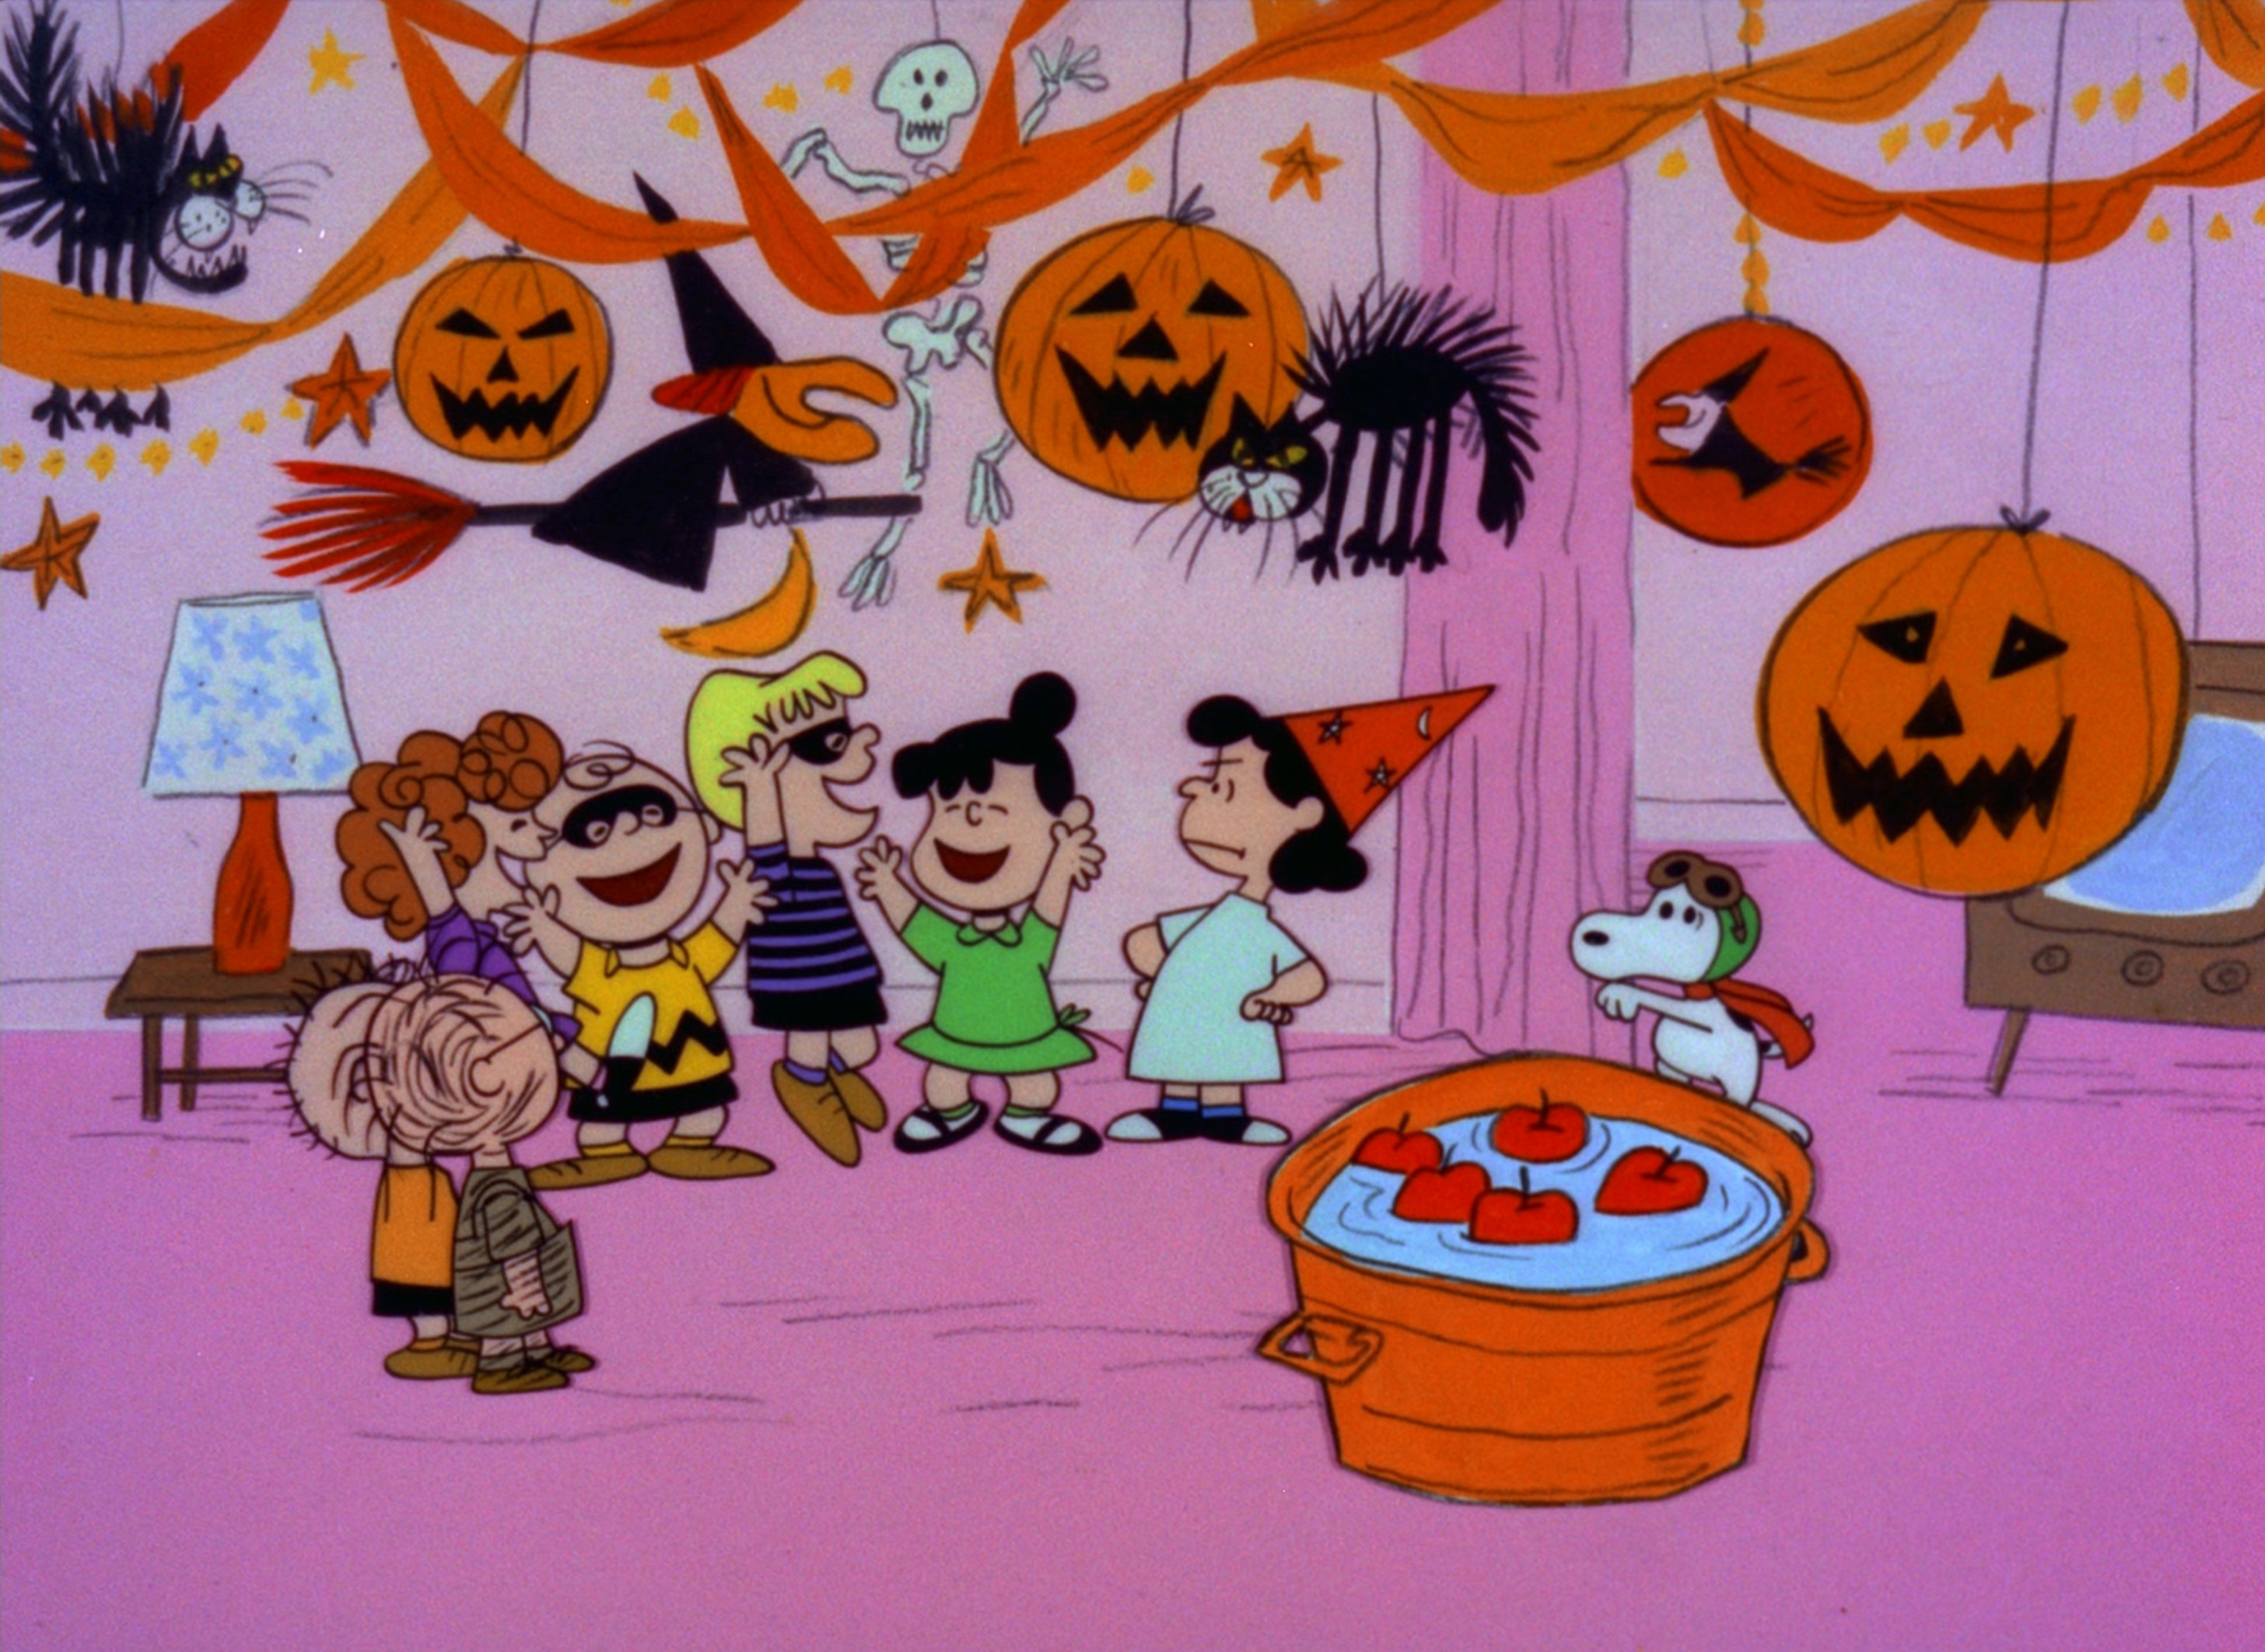 Great Pumpkin Charlie Brown Wallpaper 51 Images